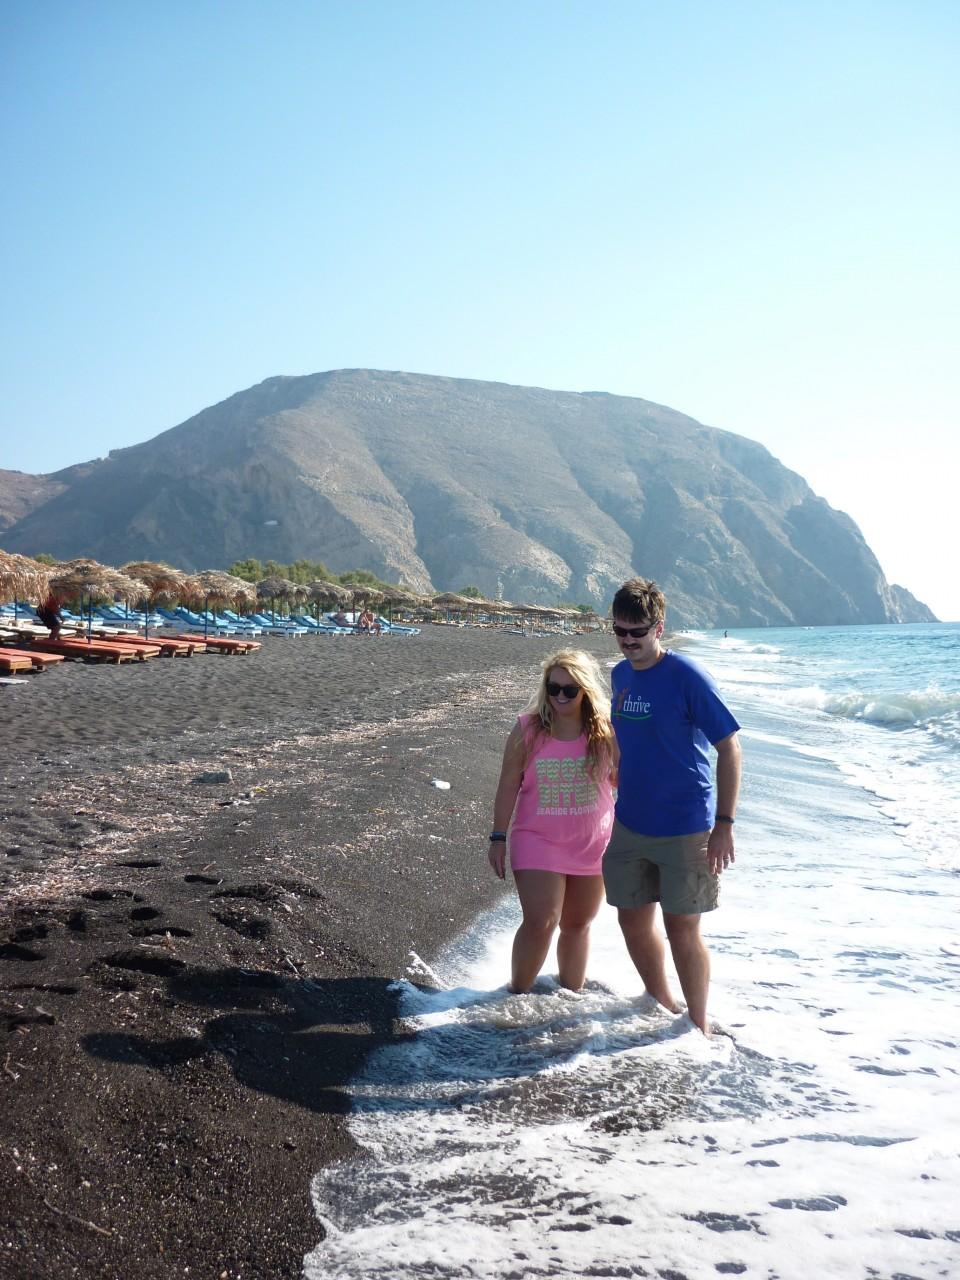 Island of Crete, Greece